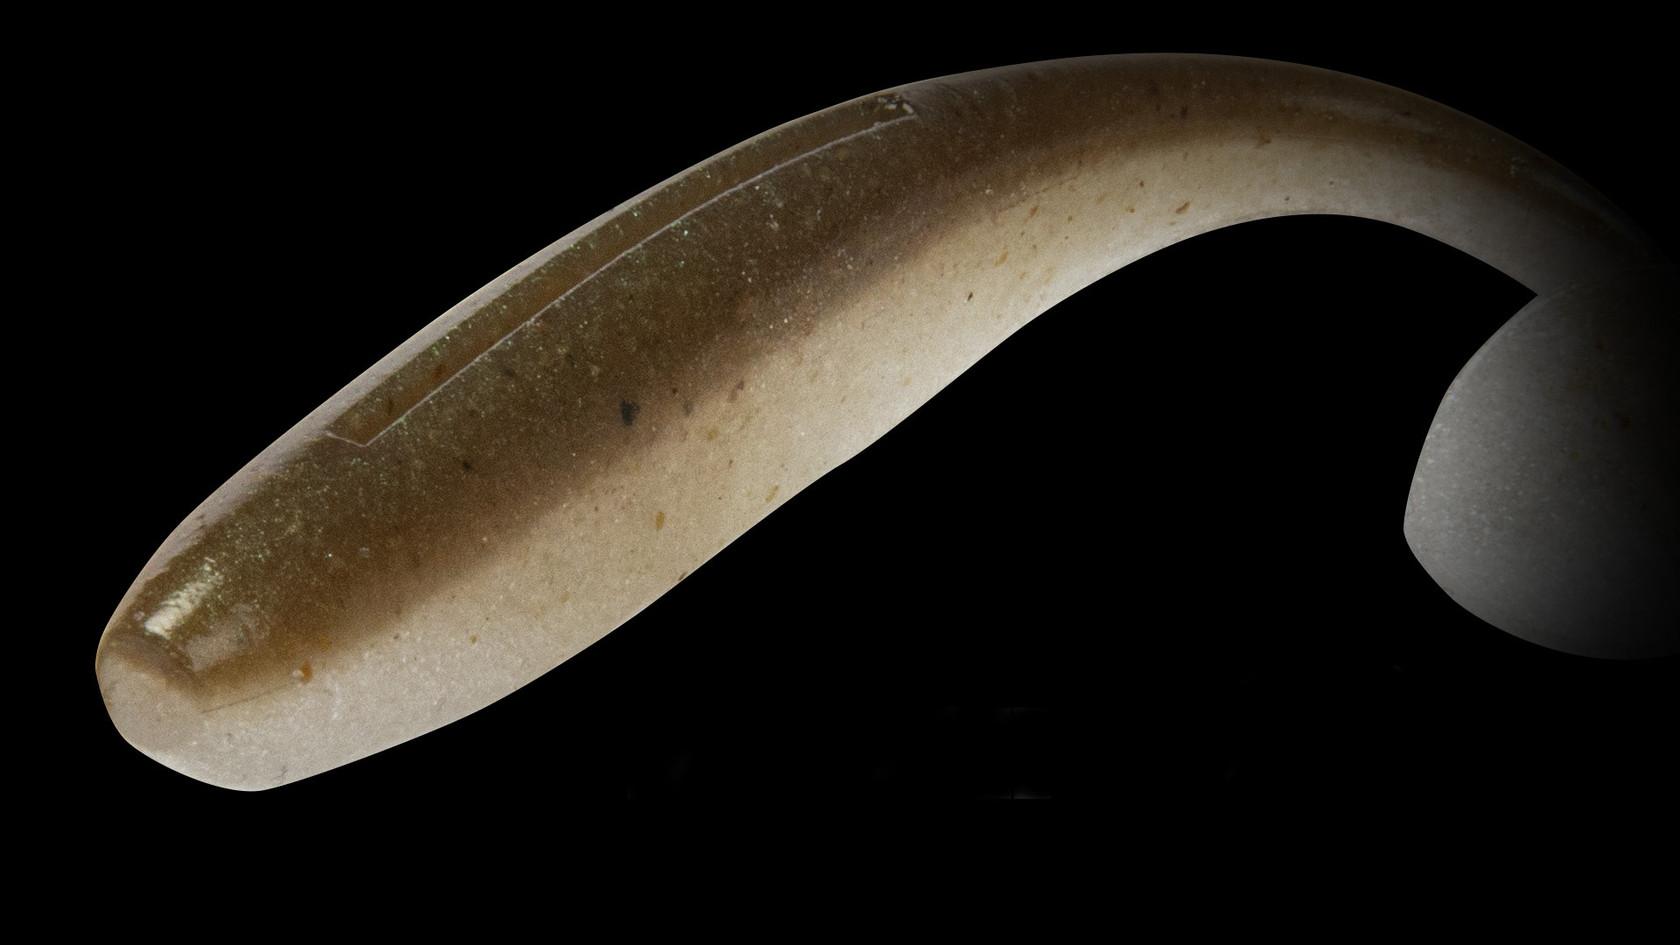 Keitech-tetiere-easy-shiner-6.5-16.5-cm.